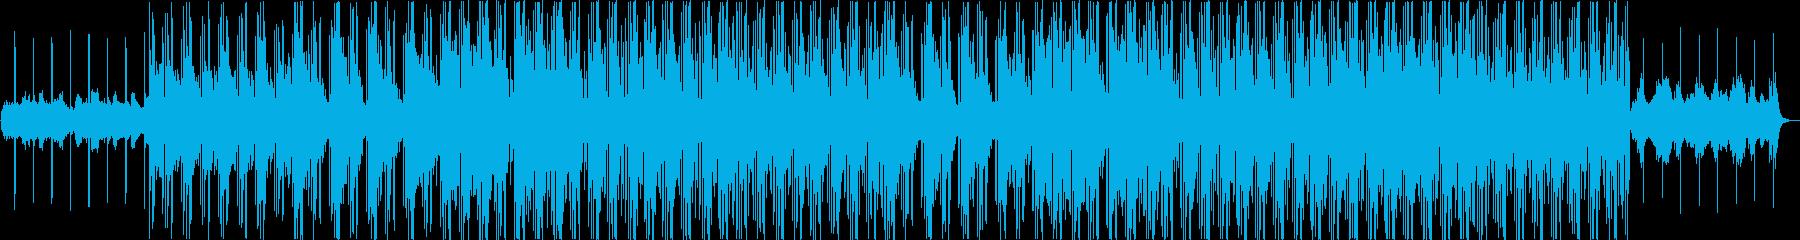 R&B英語/女性ボーカル/お洒落/洋楽の再生済みの波形